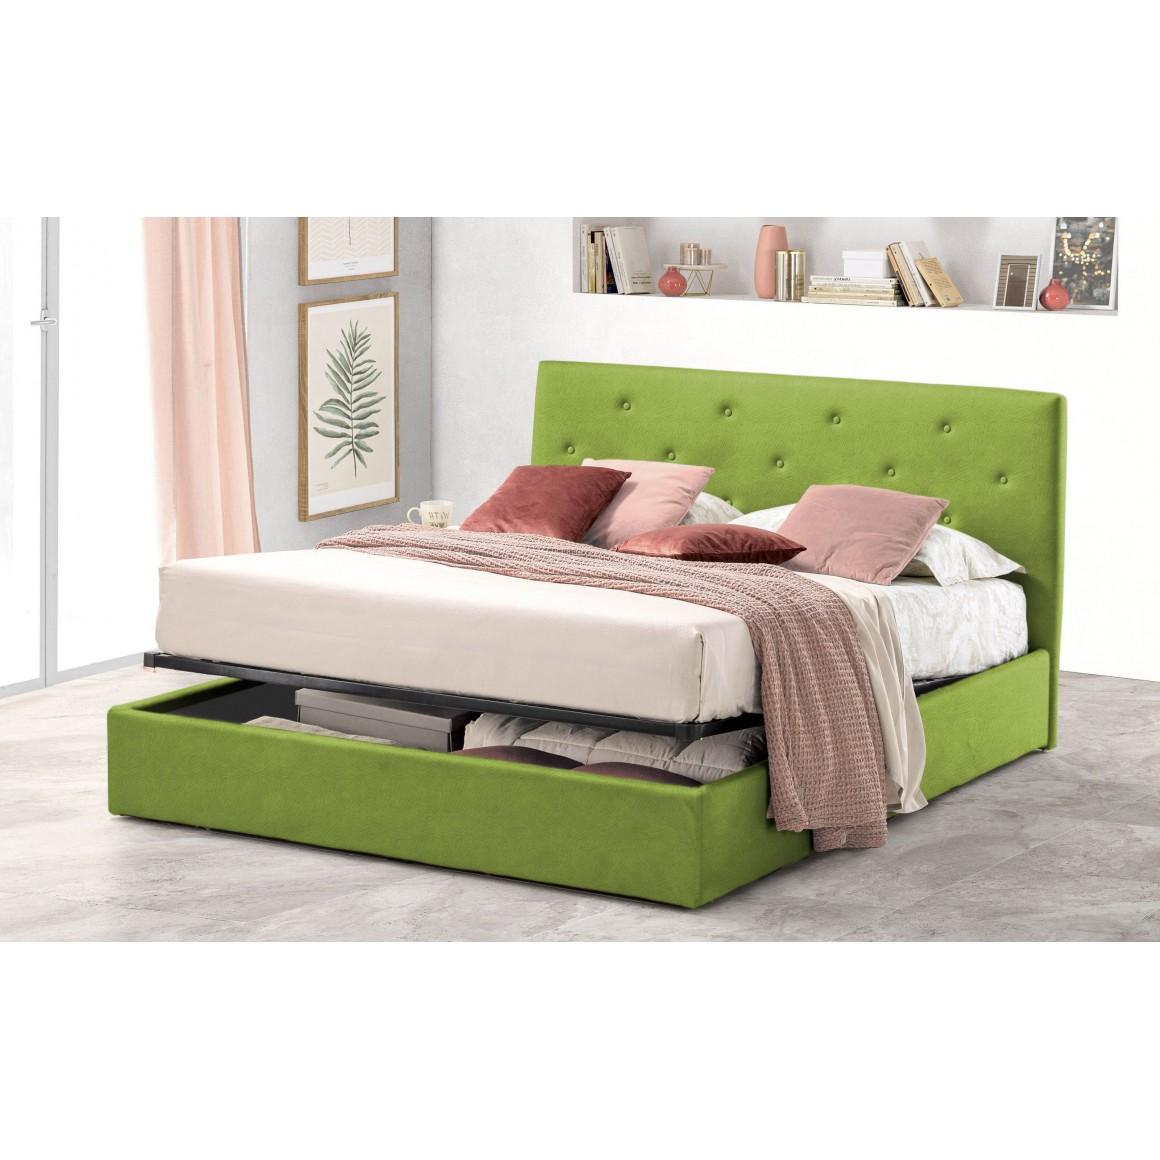 Pat Tapitat pentru Dormitor cu Lada, 180x200, Rombo Promo Dolce Dormire, Textil Teflonat, Anti-Pete Jungle, Verde